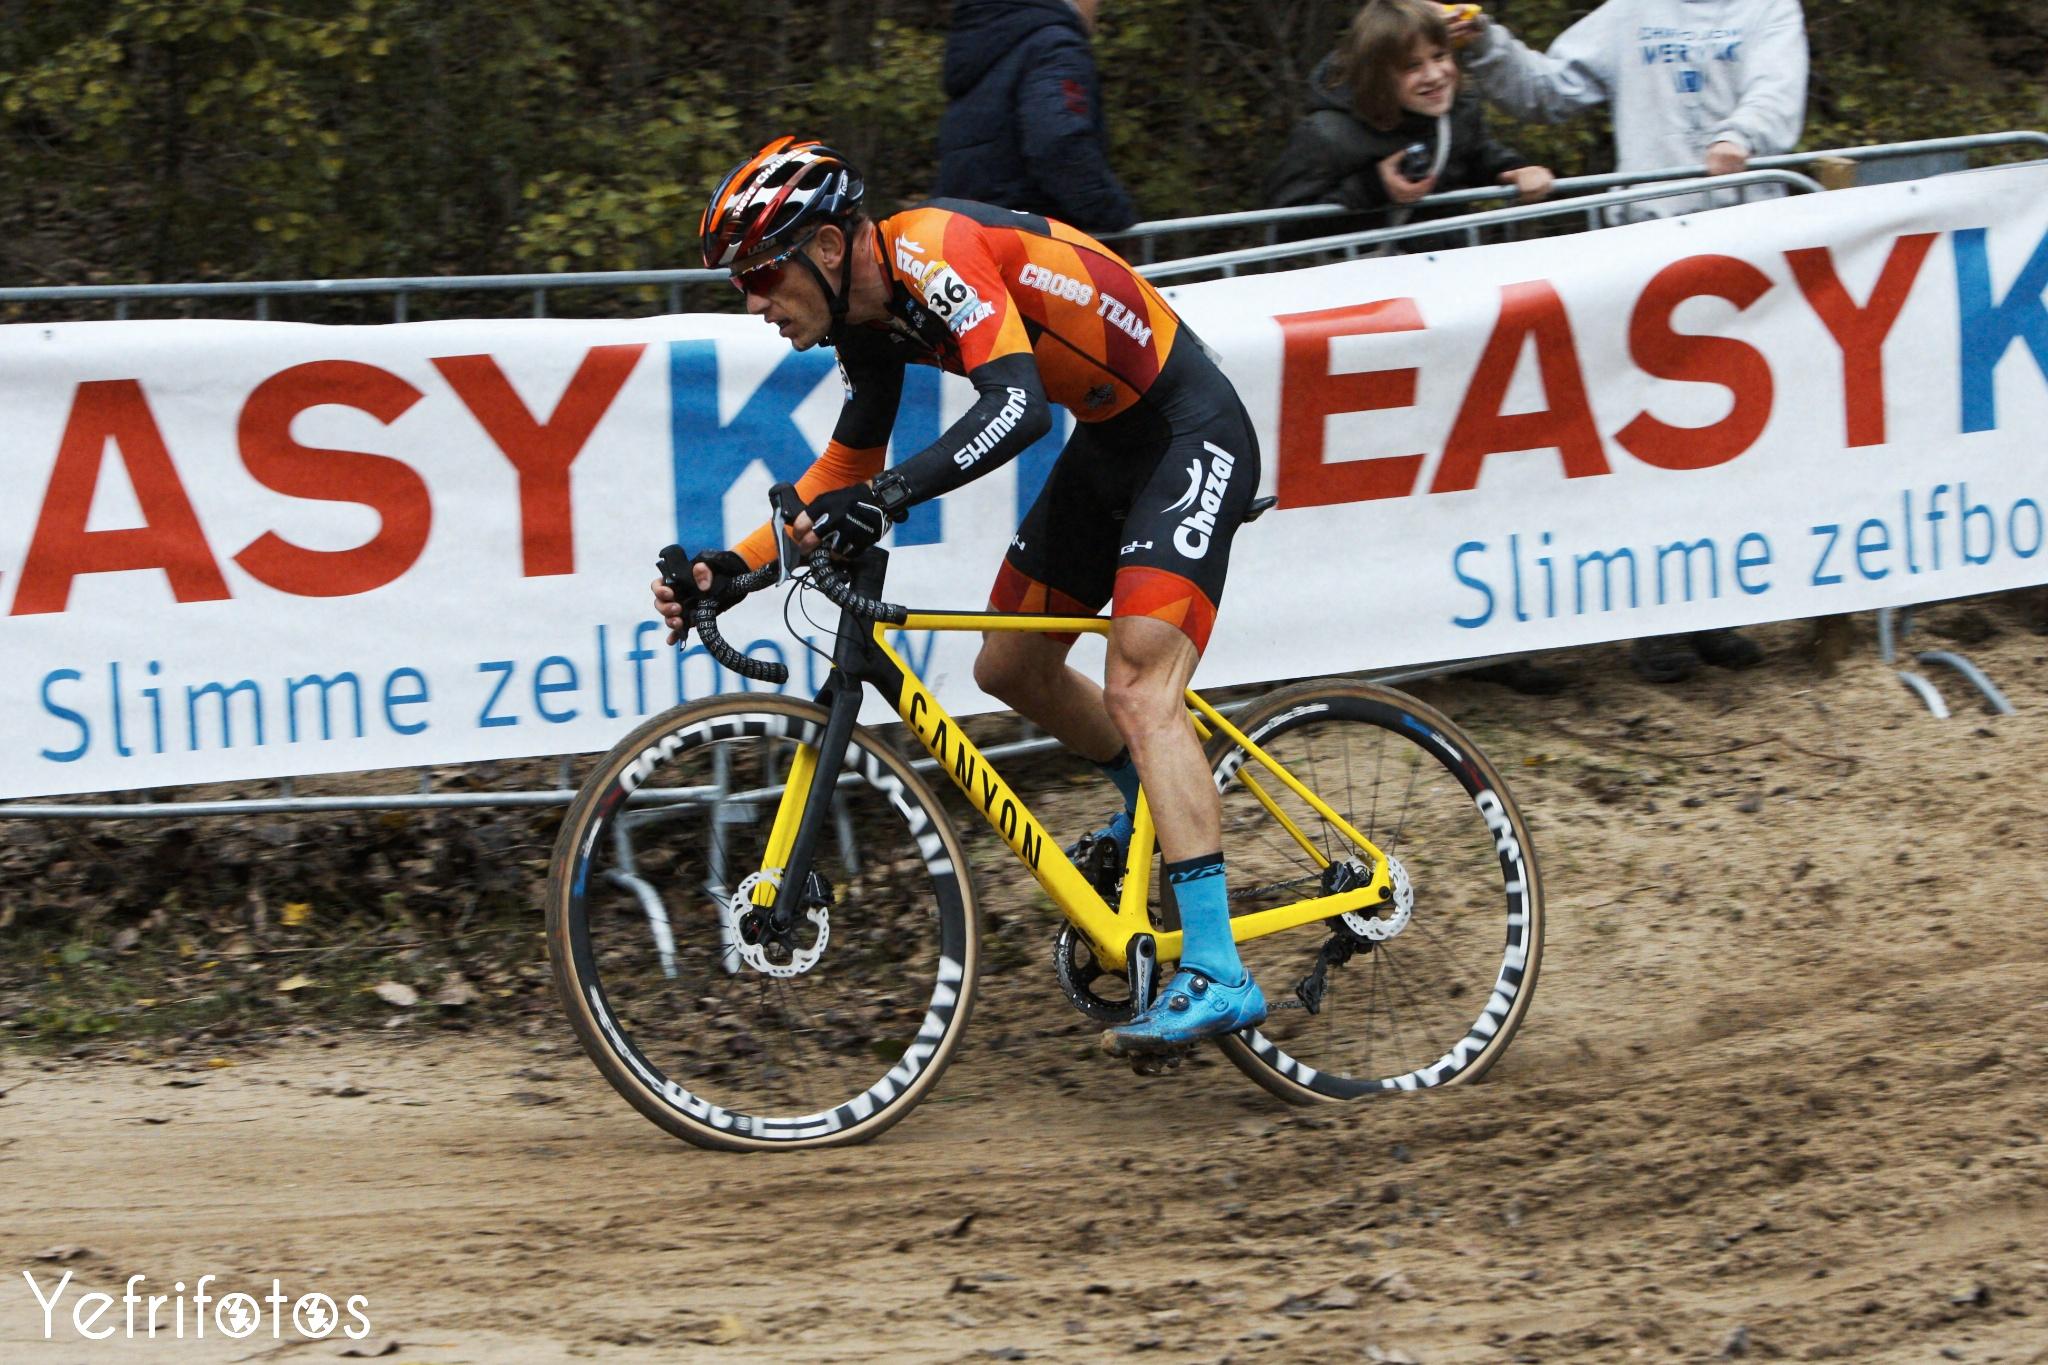 Koksijde - UCI Cyclocross World Cup - Steve Chainel